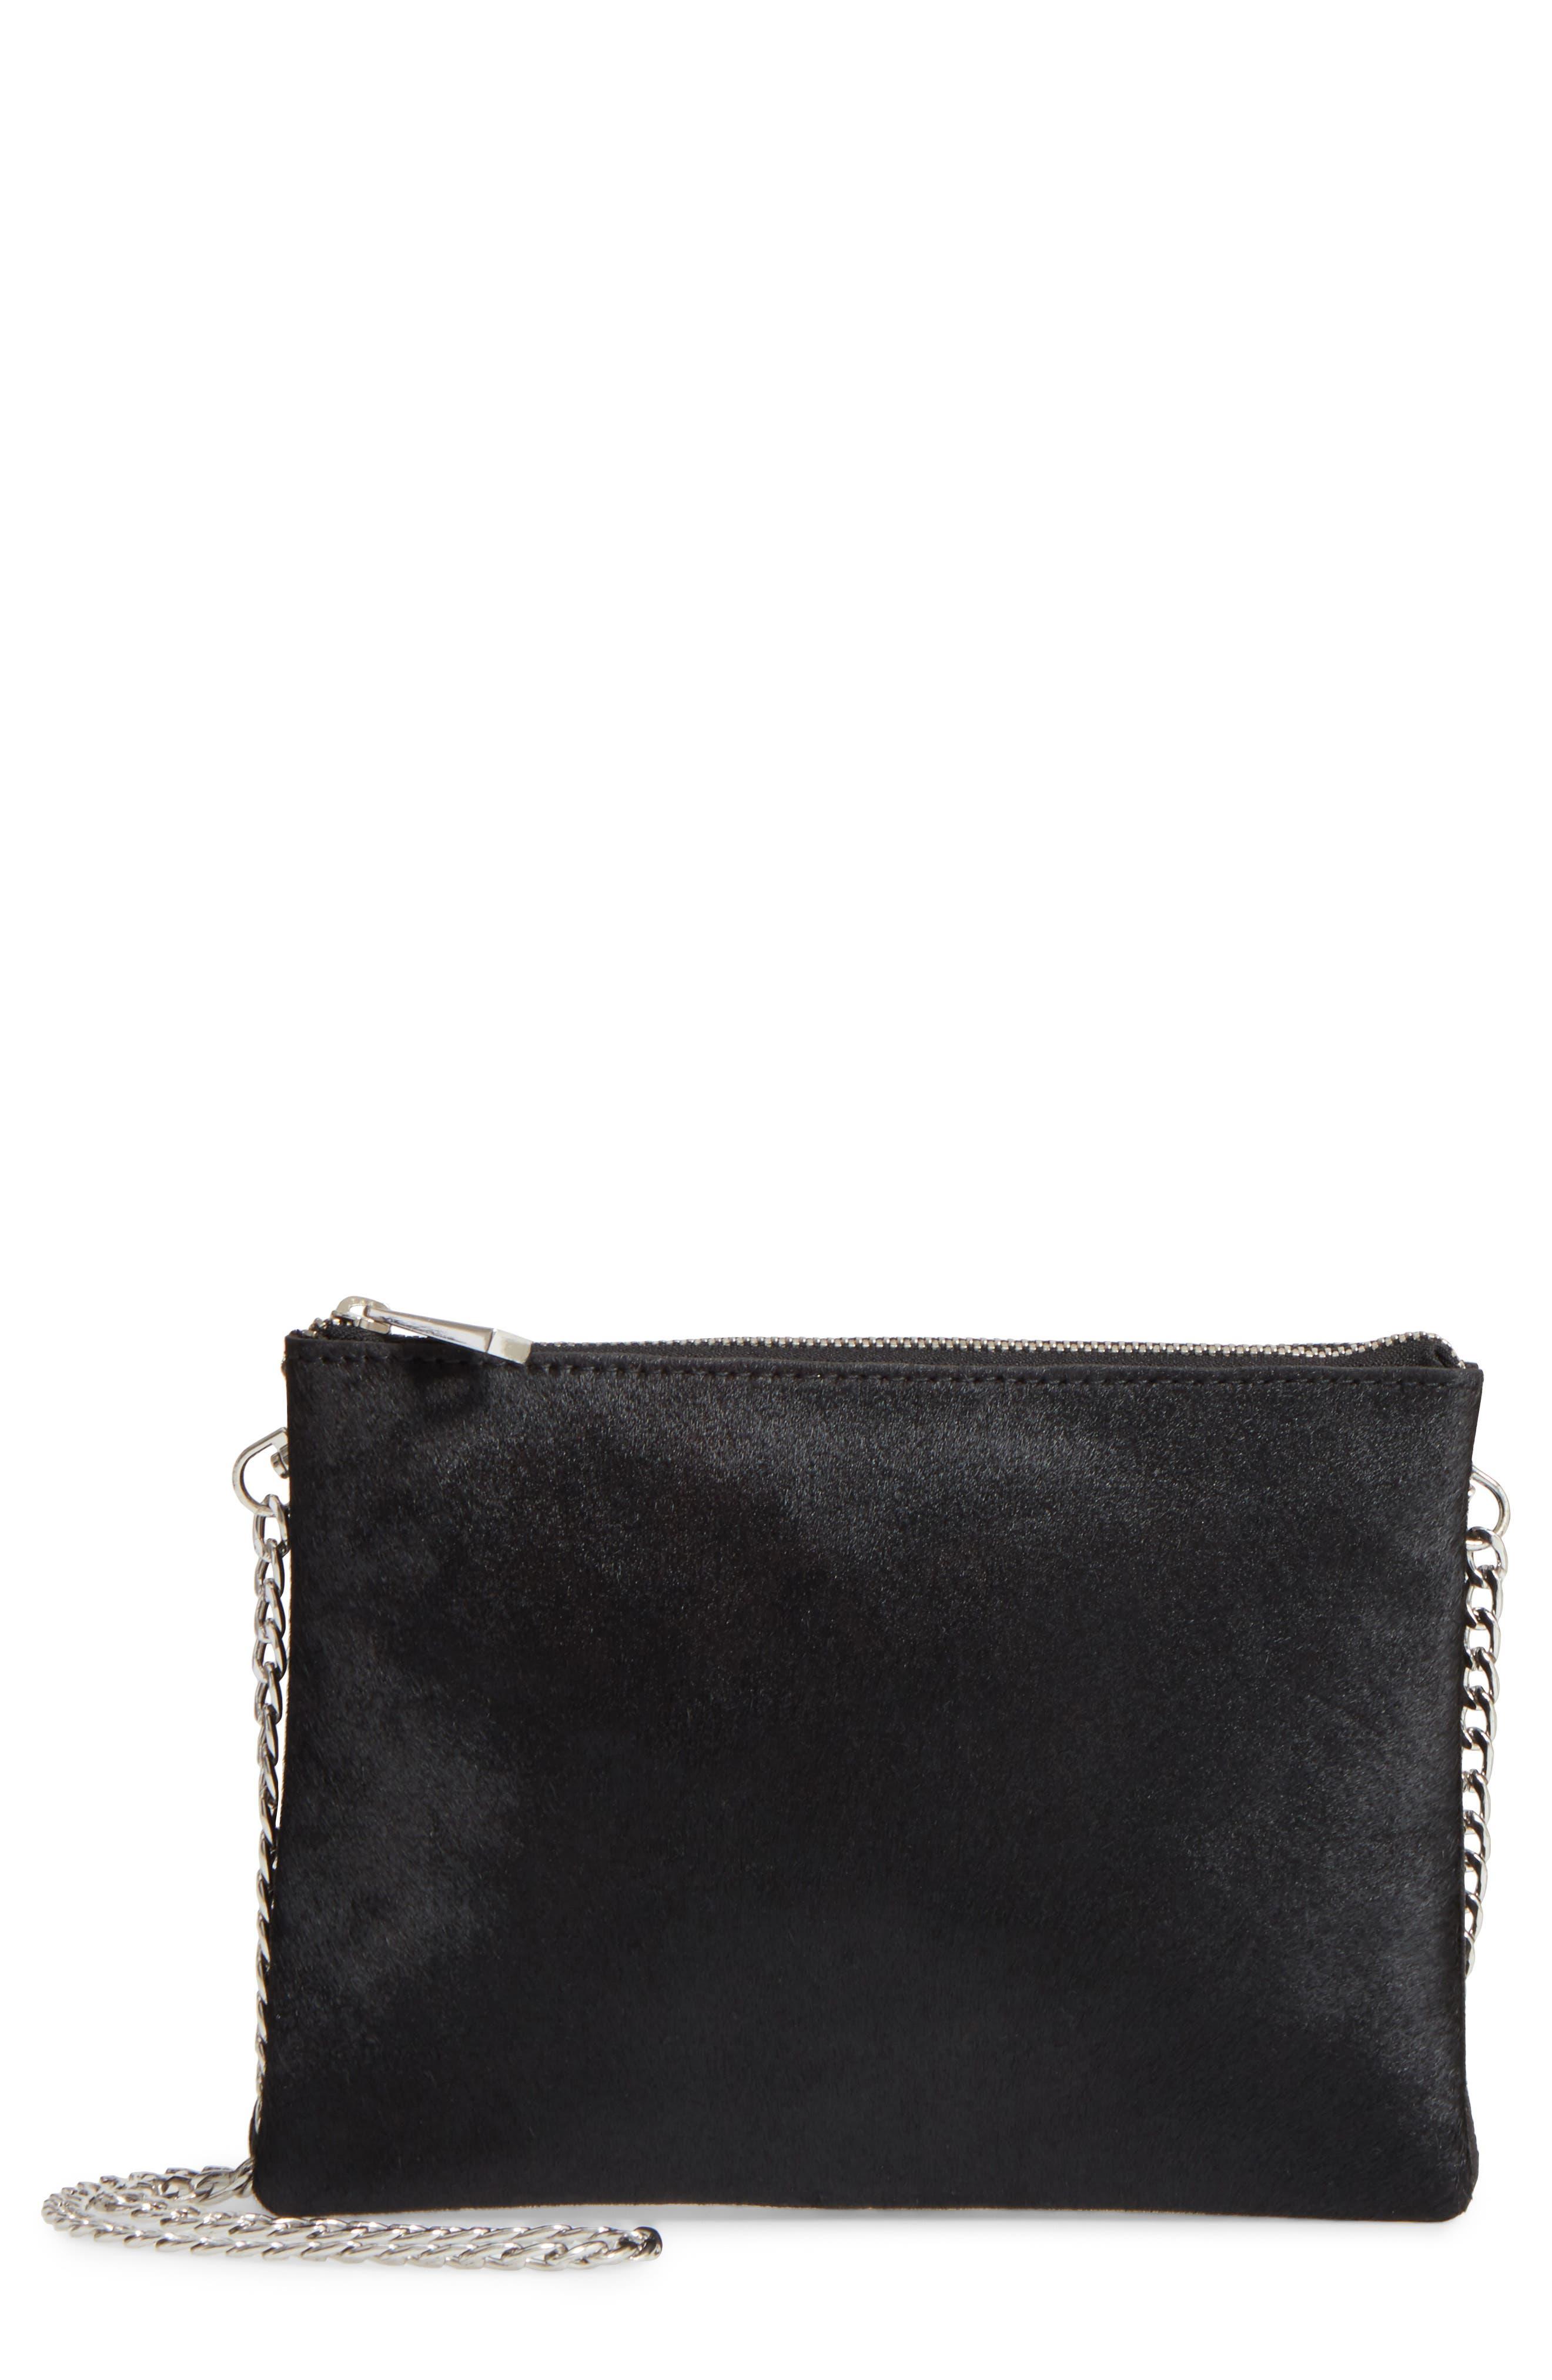 Alternate Image 1 Selected - Topshop Oakley Leather & Genuine Calf Hair Crossbody Bag